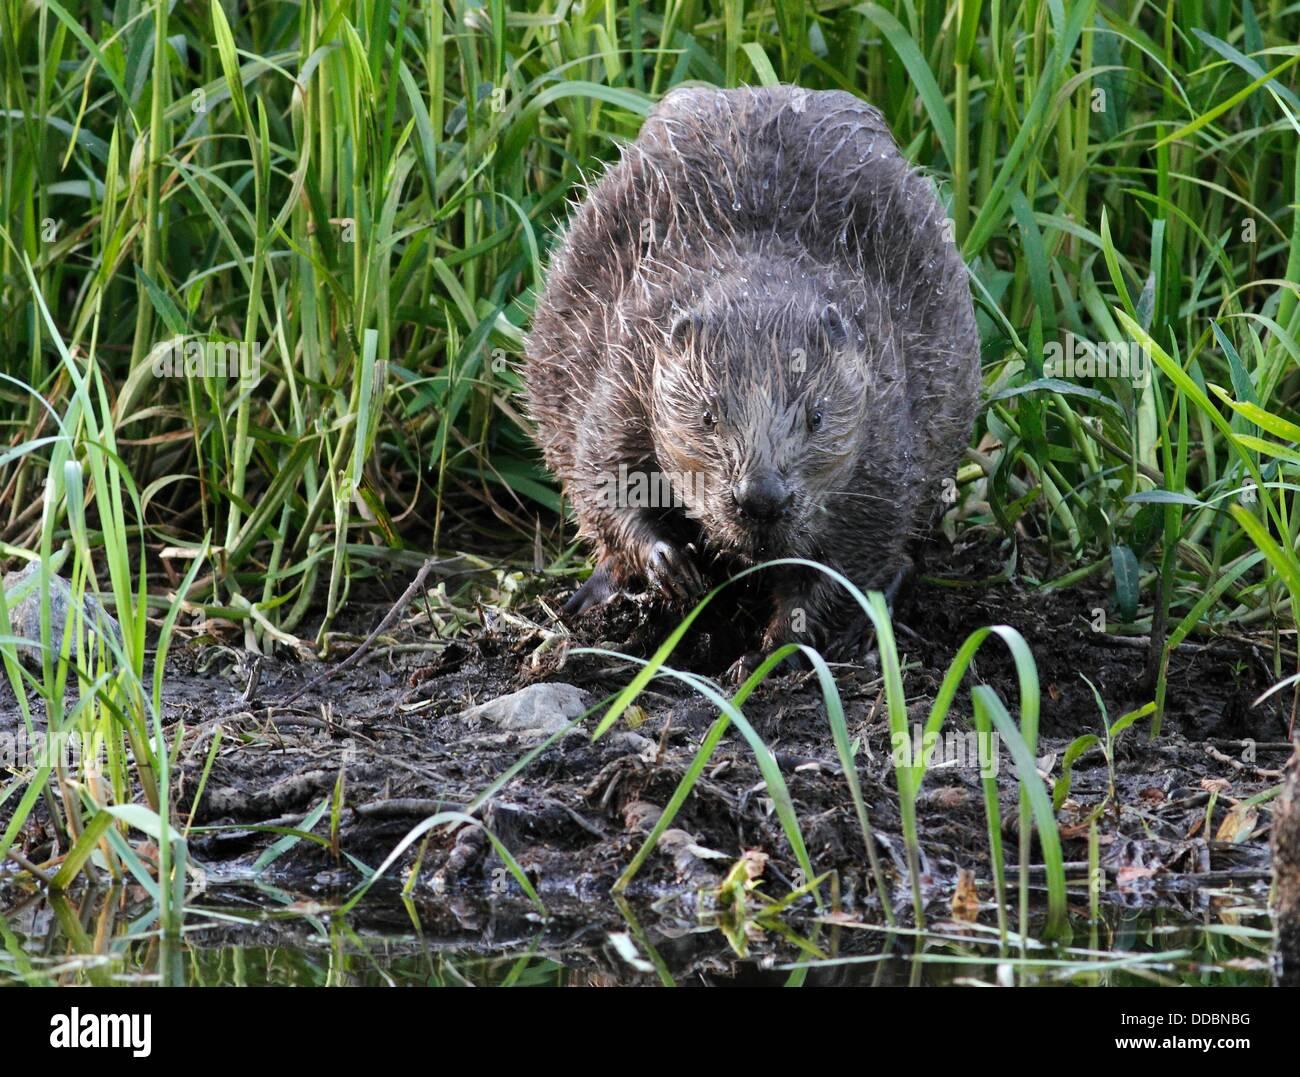 Beaver Castoridae Gnesta Sweden. Stock Photo